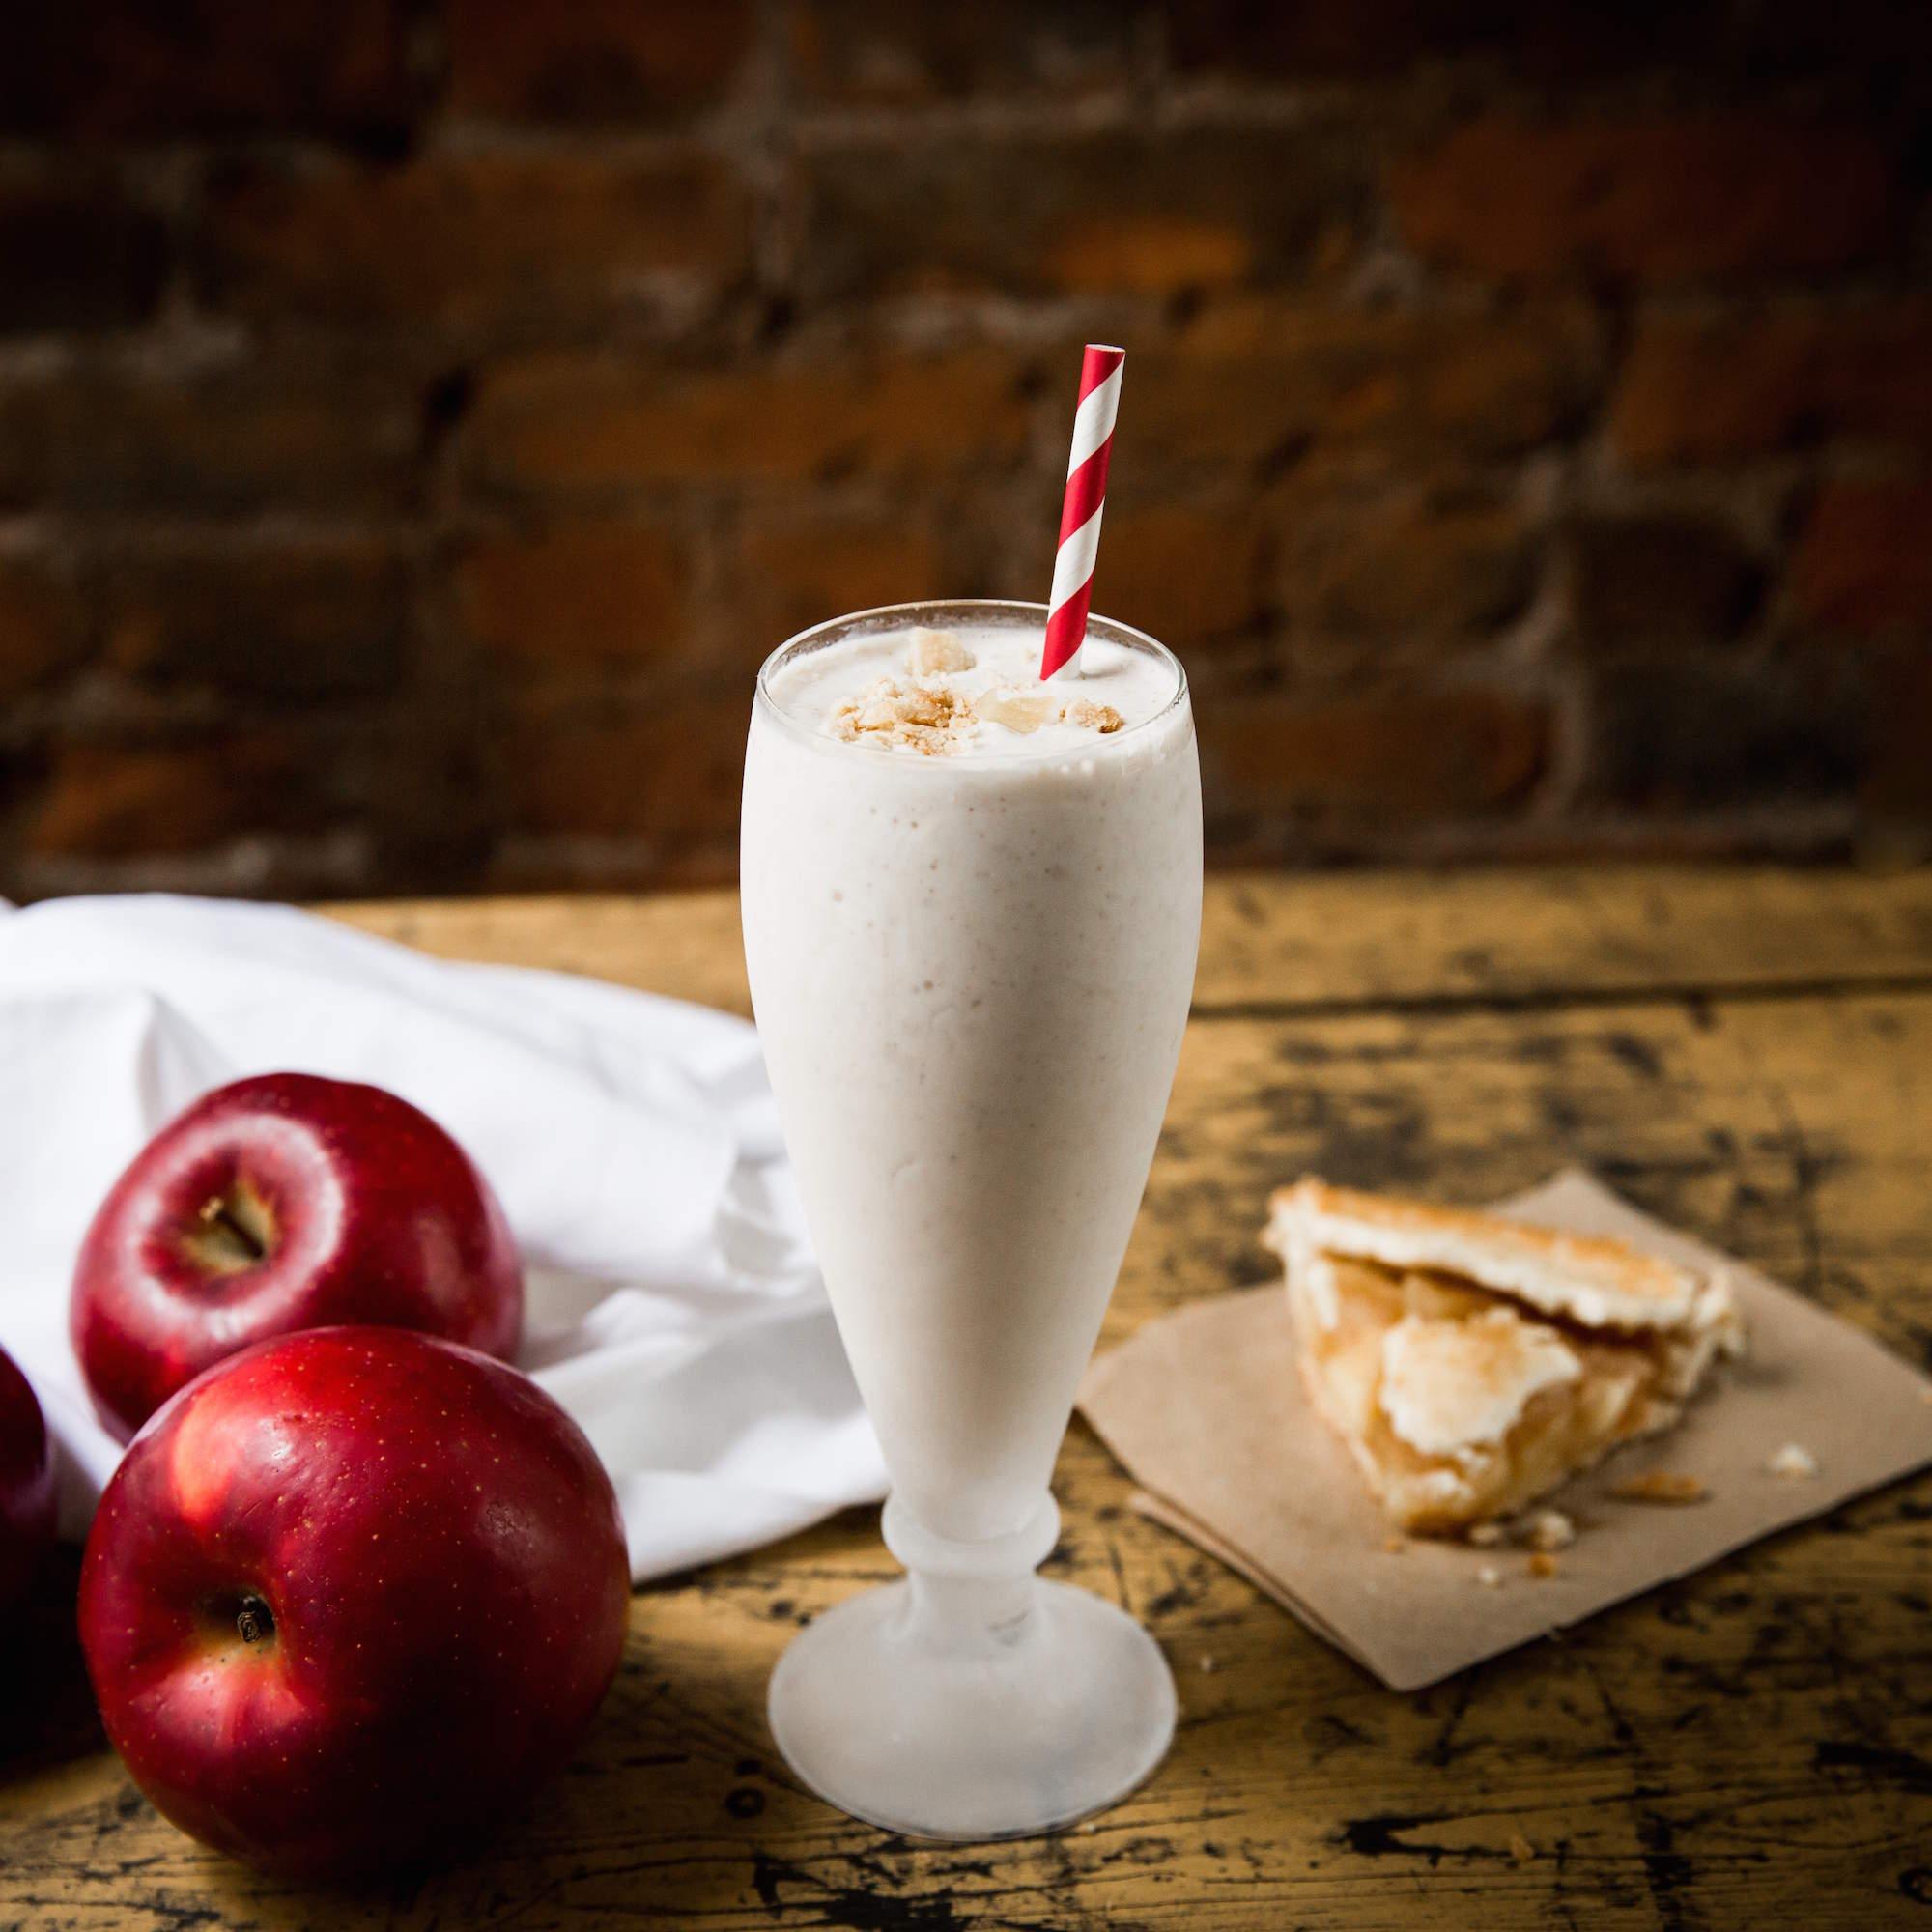 11 Boozy Milkshakes to Help You Survive August